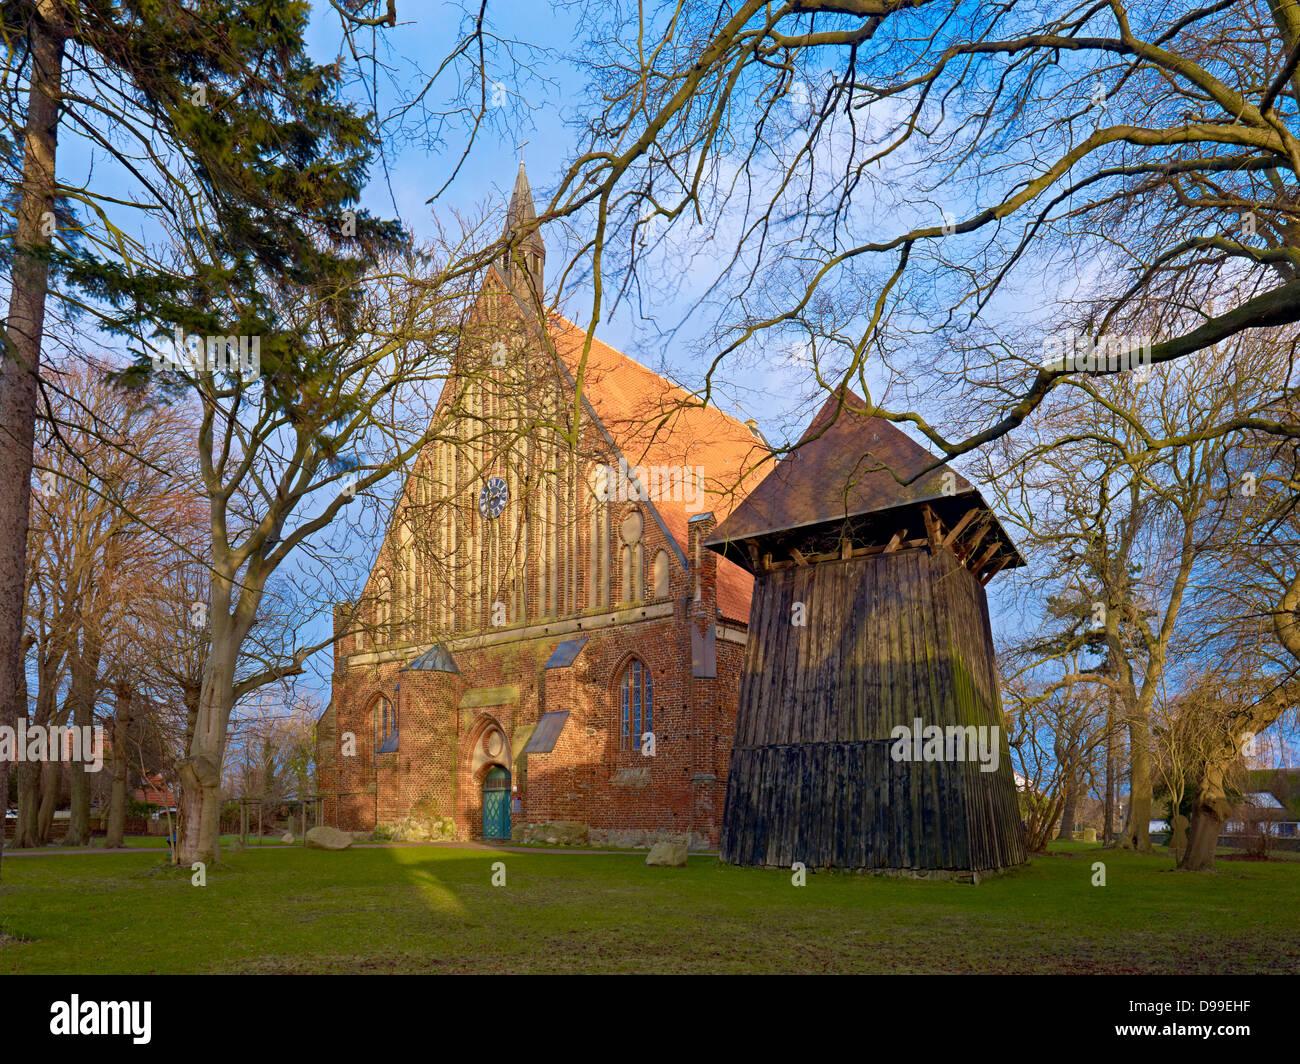 Saint Gerorg Church in Wiek, Ruegen Island, Mecklenburg-Western Pomerania, Germany - Stock Image